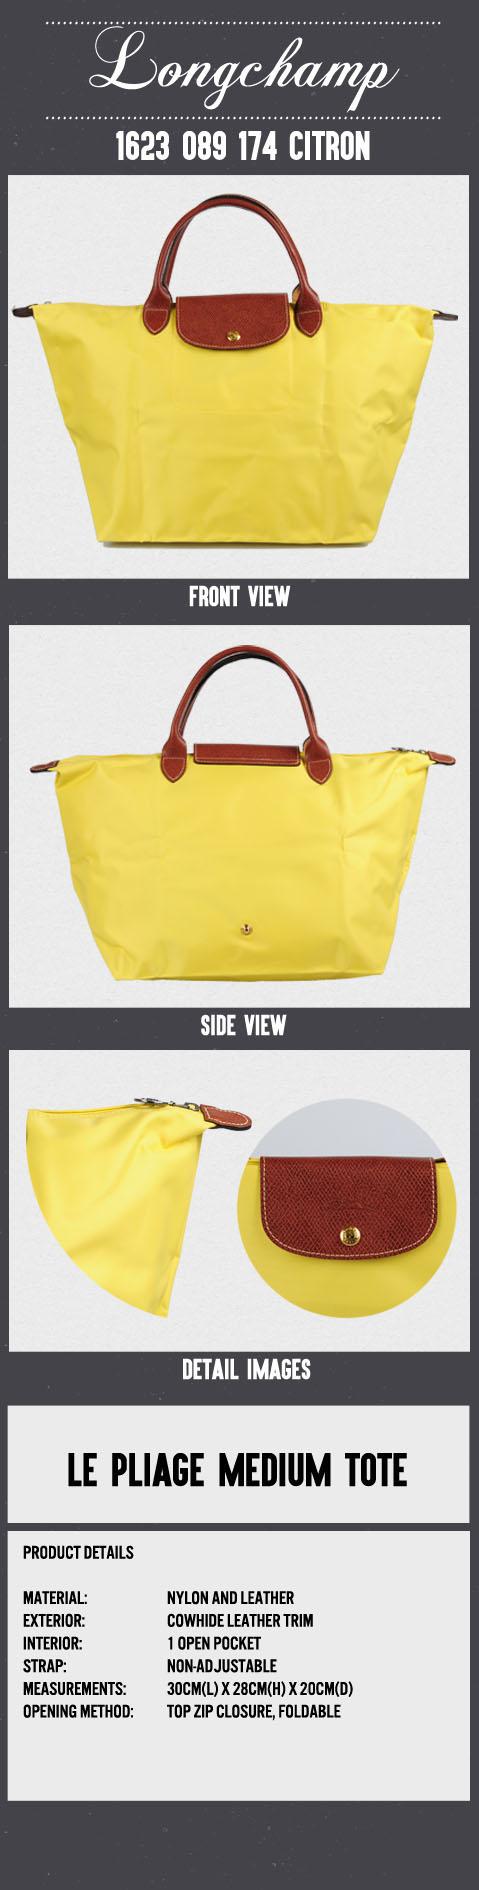 Limited Light Longchamp Travel Bags 1515 737 226 Camel